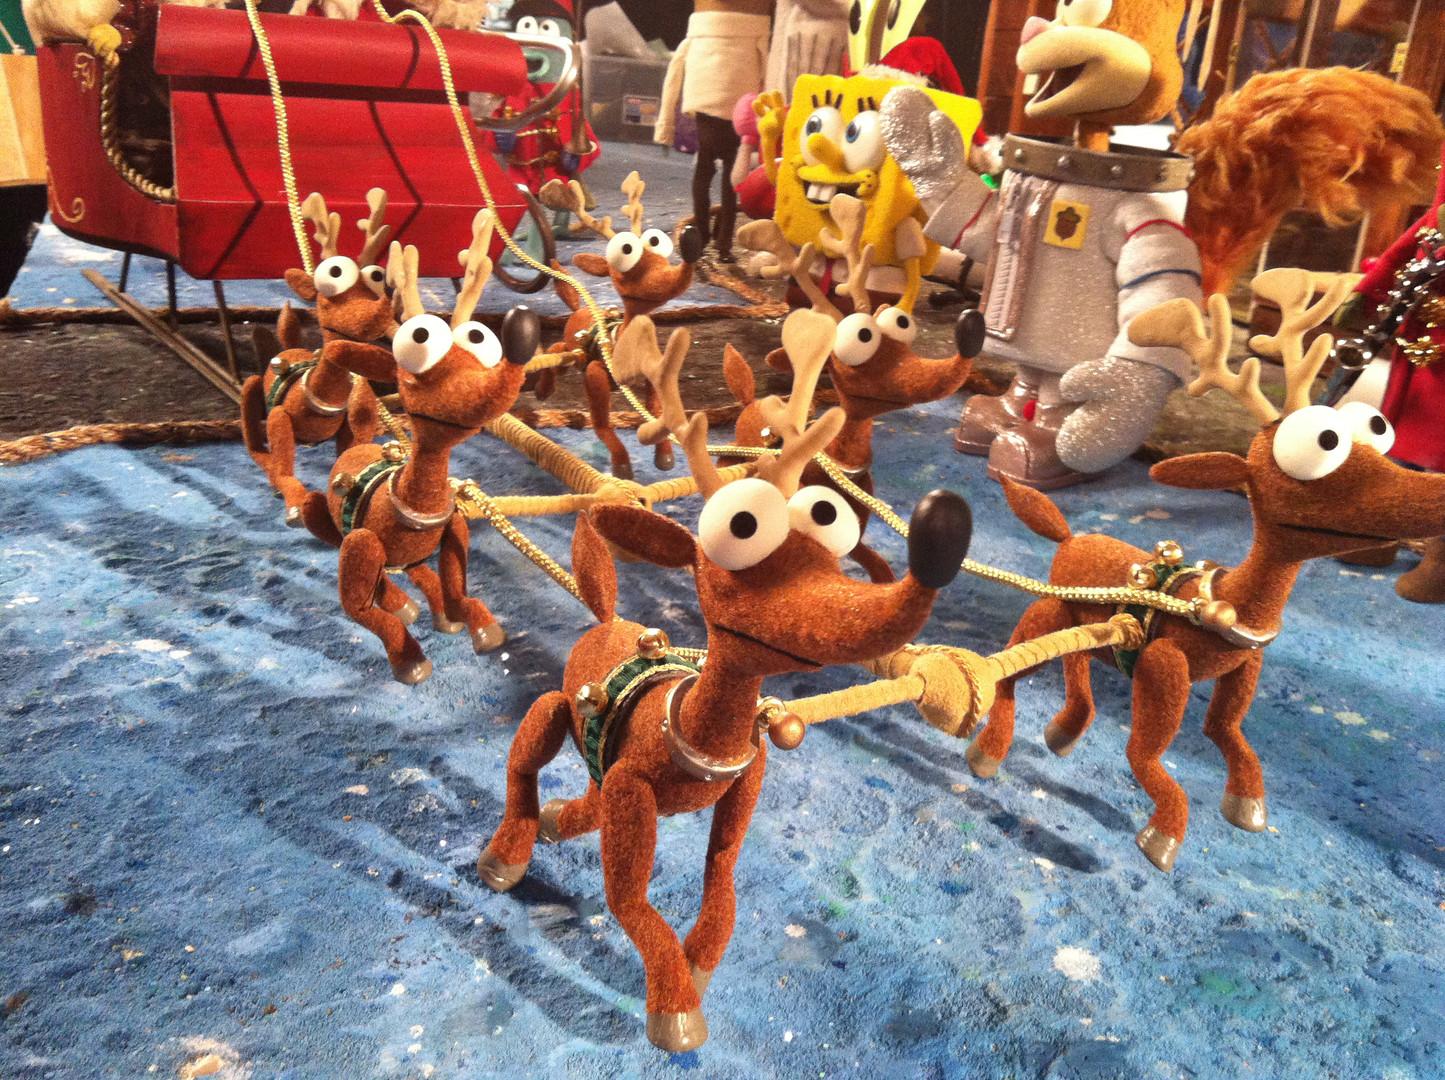 Reindeers - It's A Spongebob Christmas